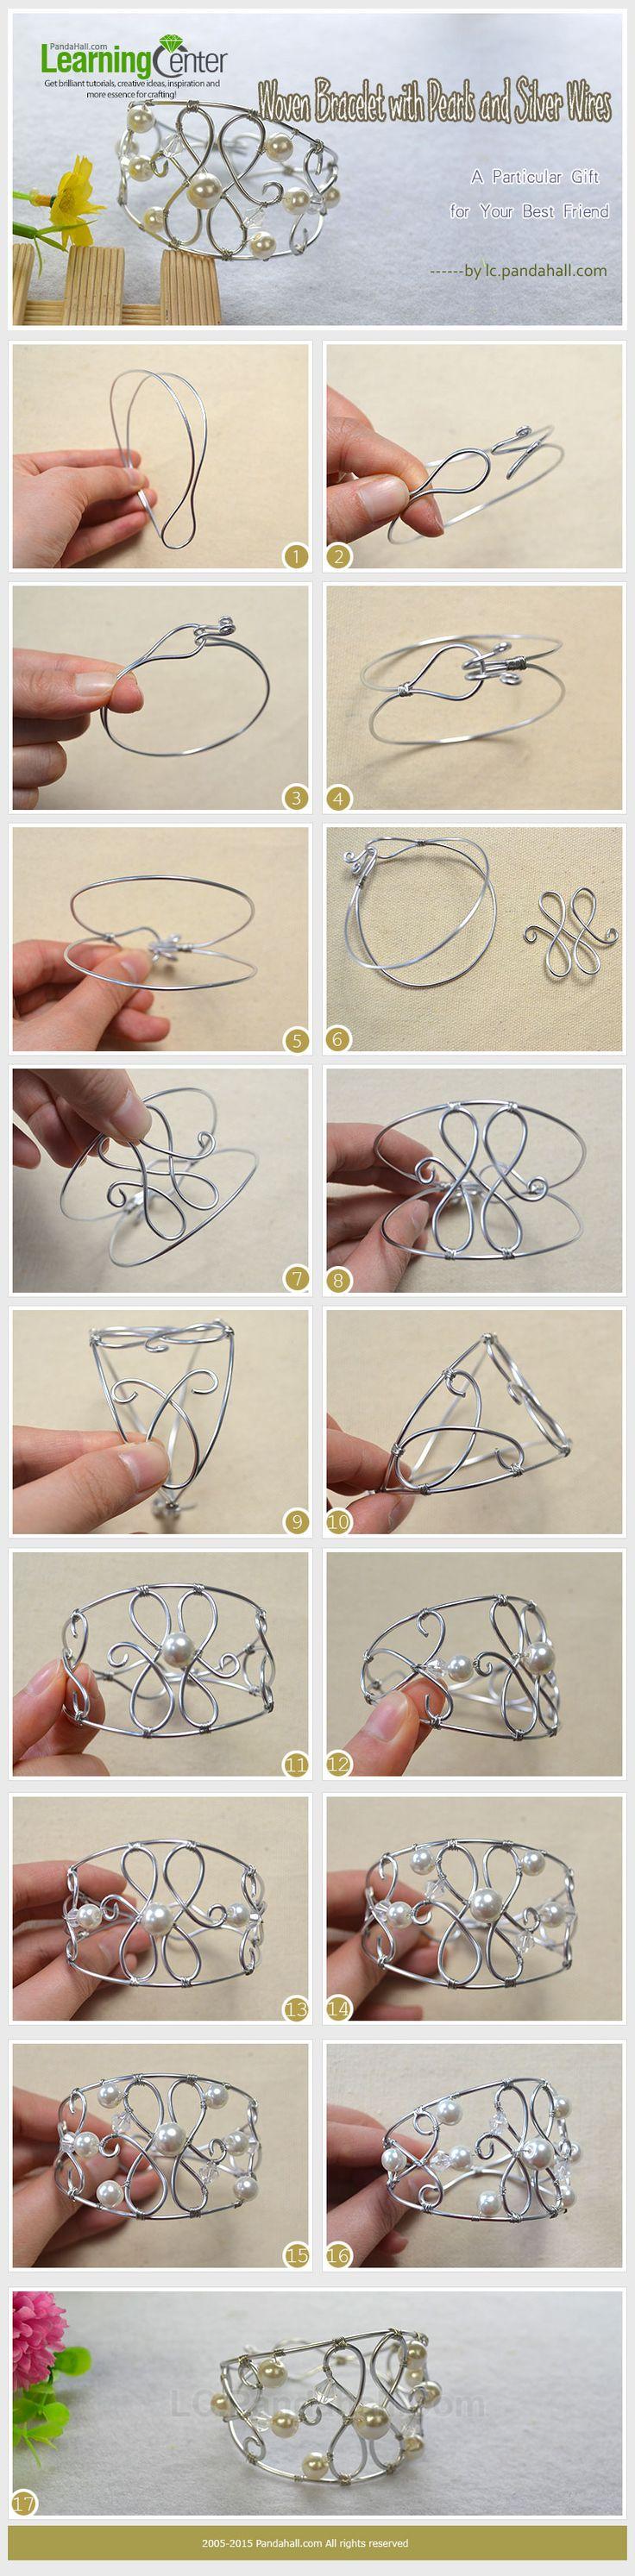 842 best wire jewelry images on Pinterest | Jewelry ideas, Diy ...